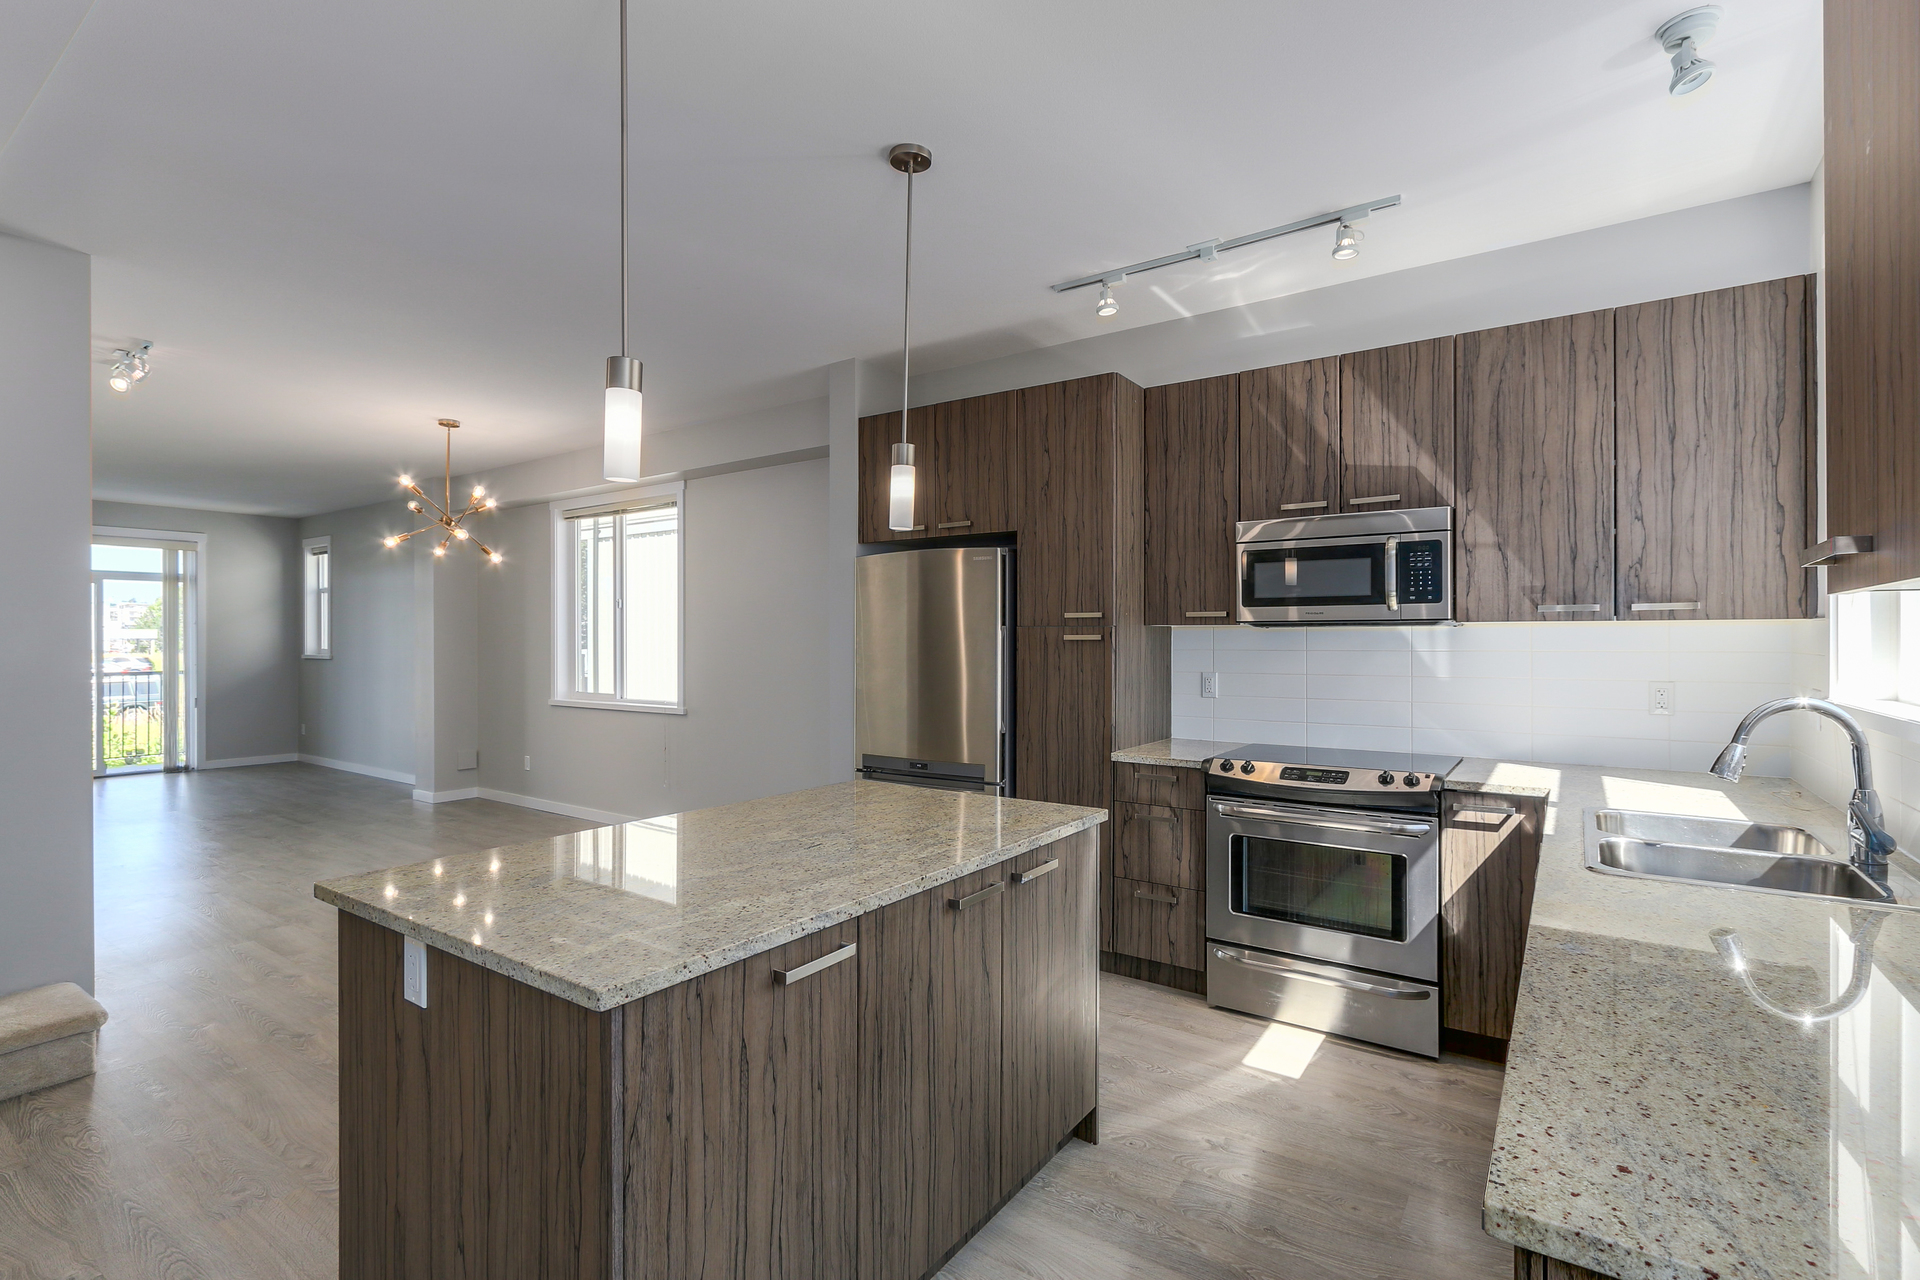 55 8355 164 Street, Surrey BC Granite Countertops at 55 - 8355 164 Street, Fleetwood Tynehead, Surrey